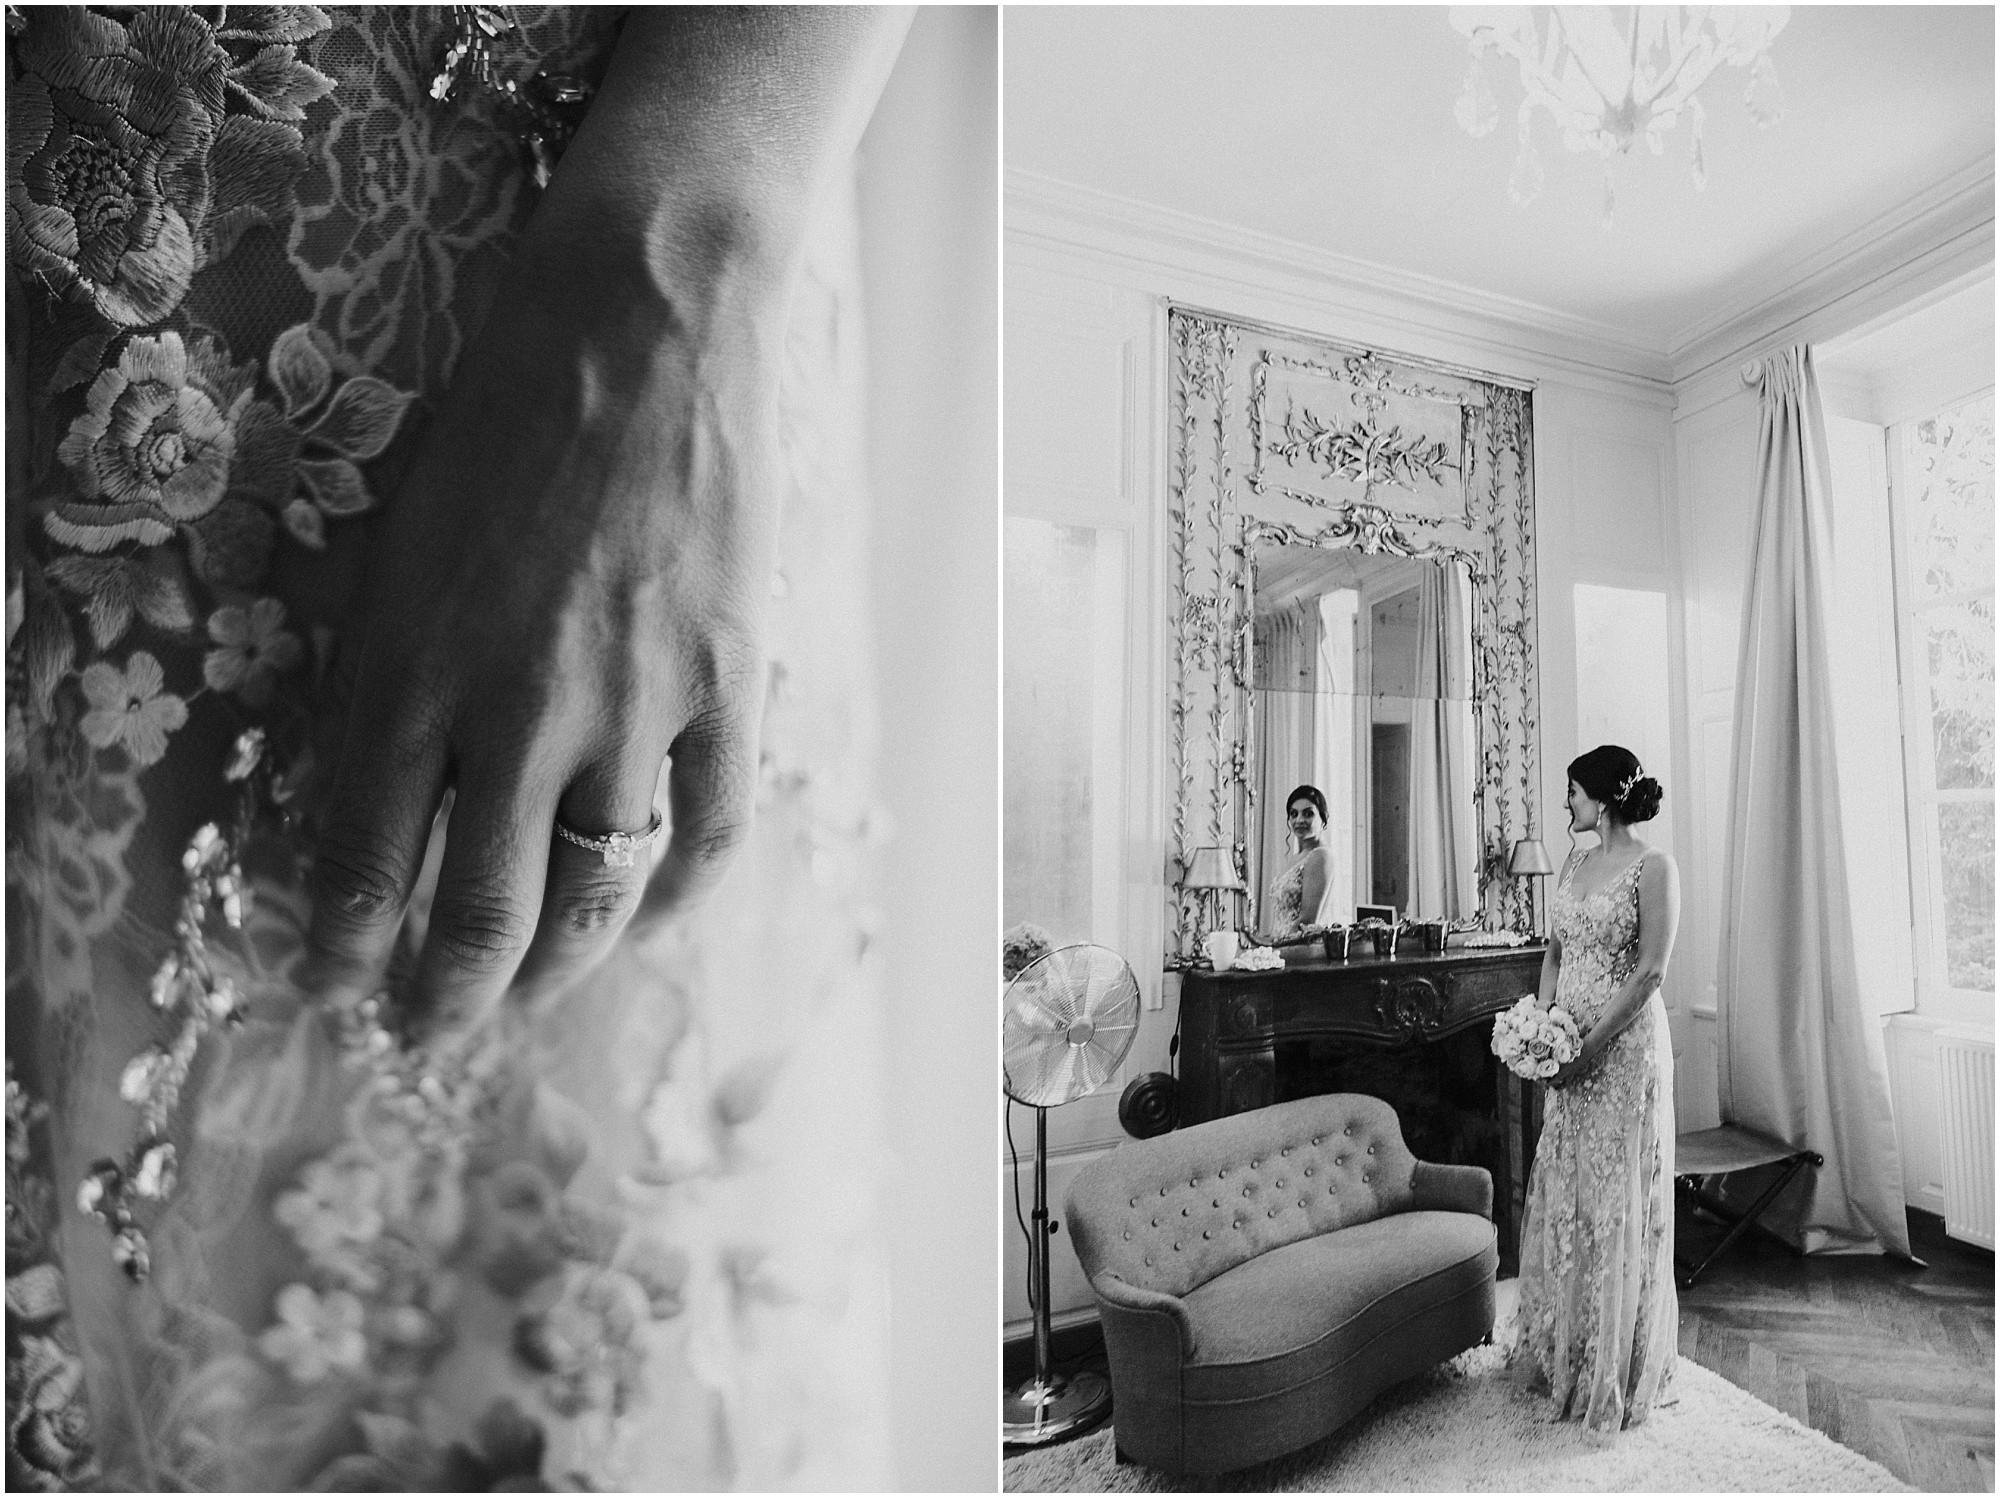 Kateryna-photos-photographer-mariage-chateau-saint-paterne-alencon-normandie-mayenne-le-mans_0041.jpg